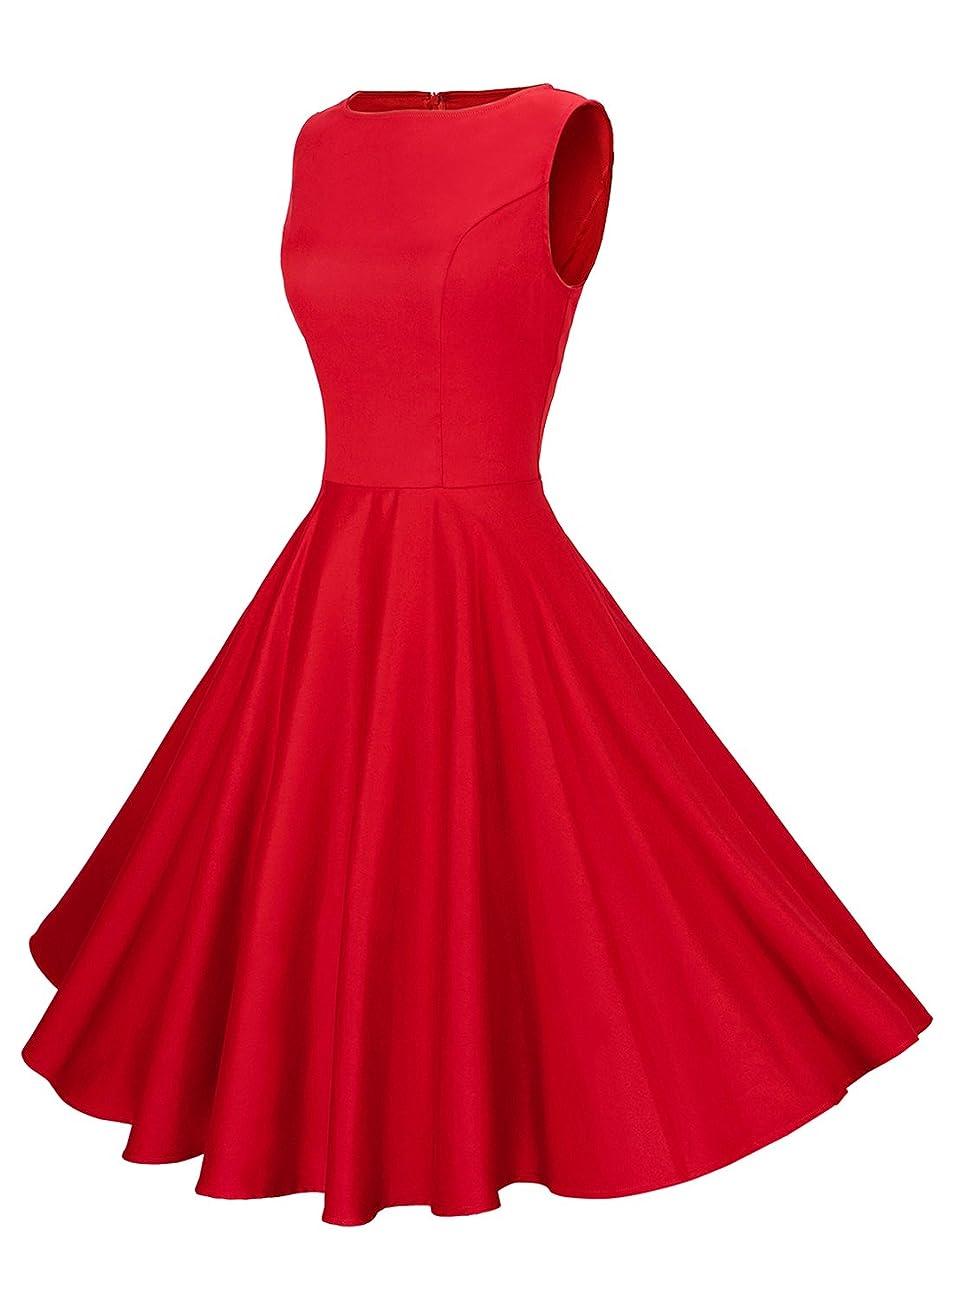 Anni Coco Women's Classy Audrey Hepburn 1950s Vintage Rockabilly Swing Dress 1